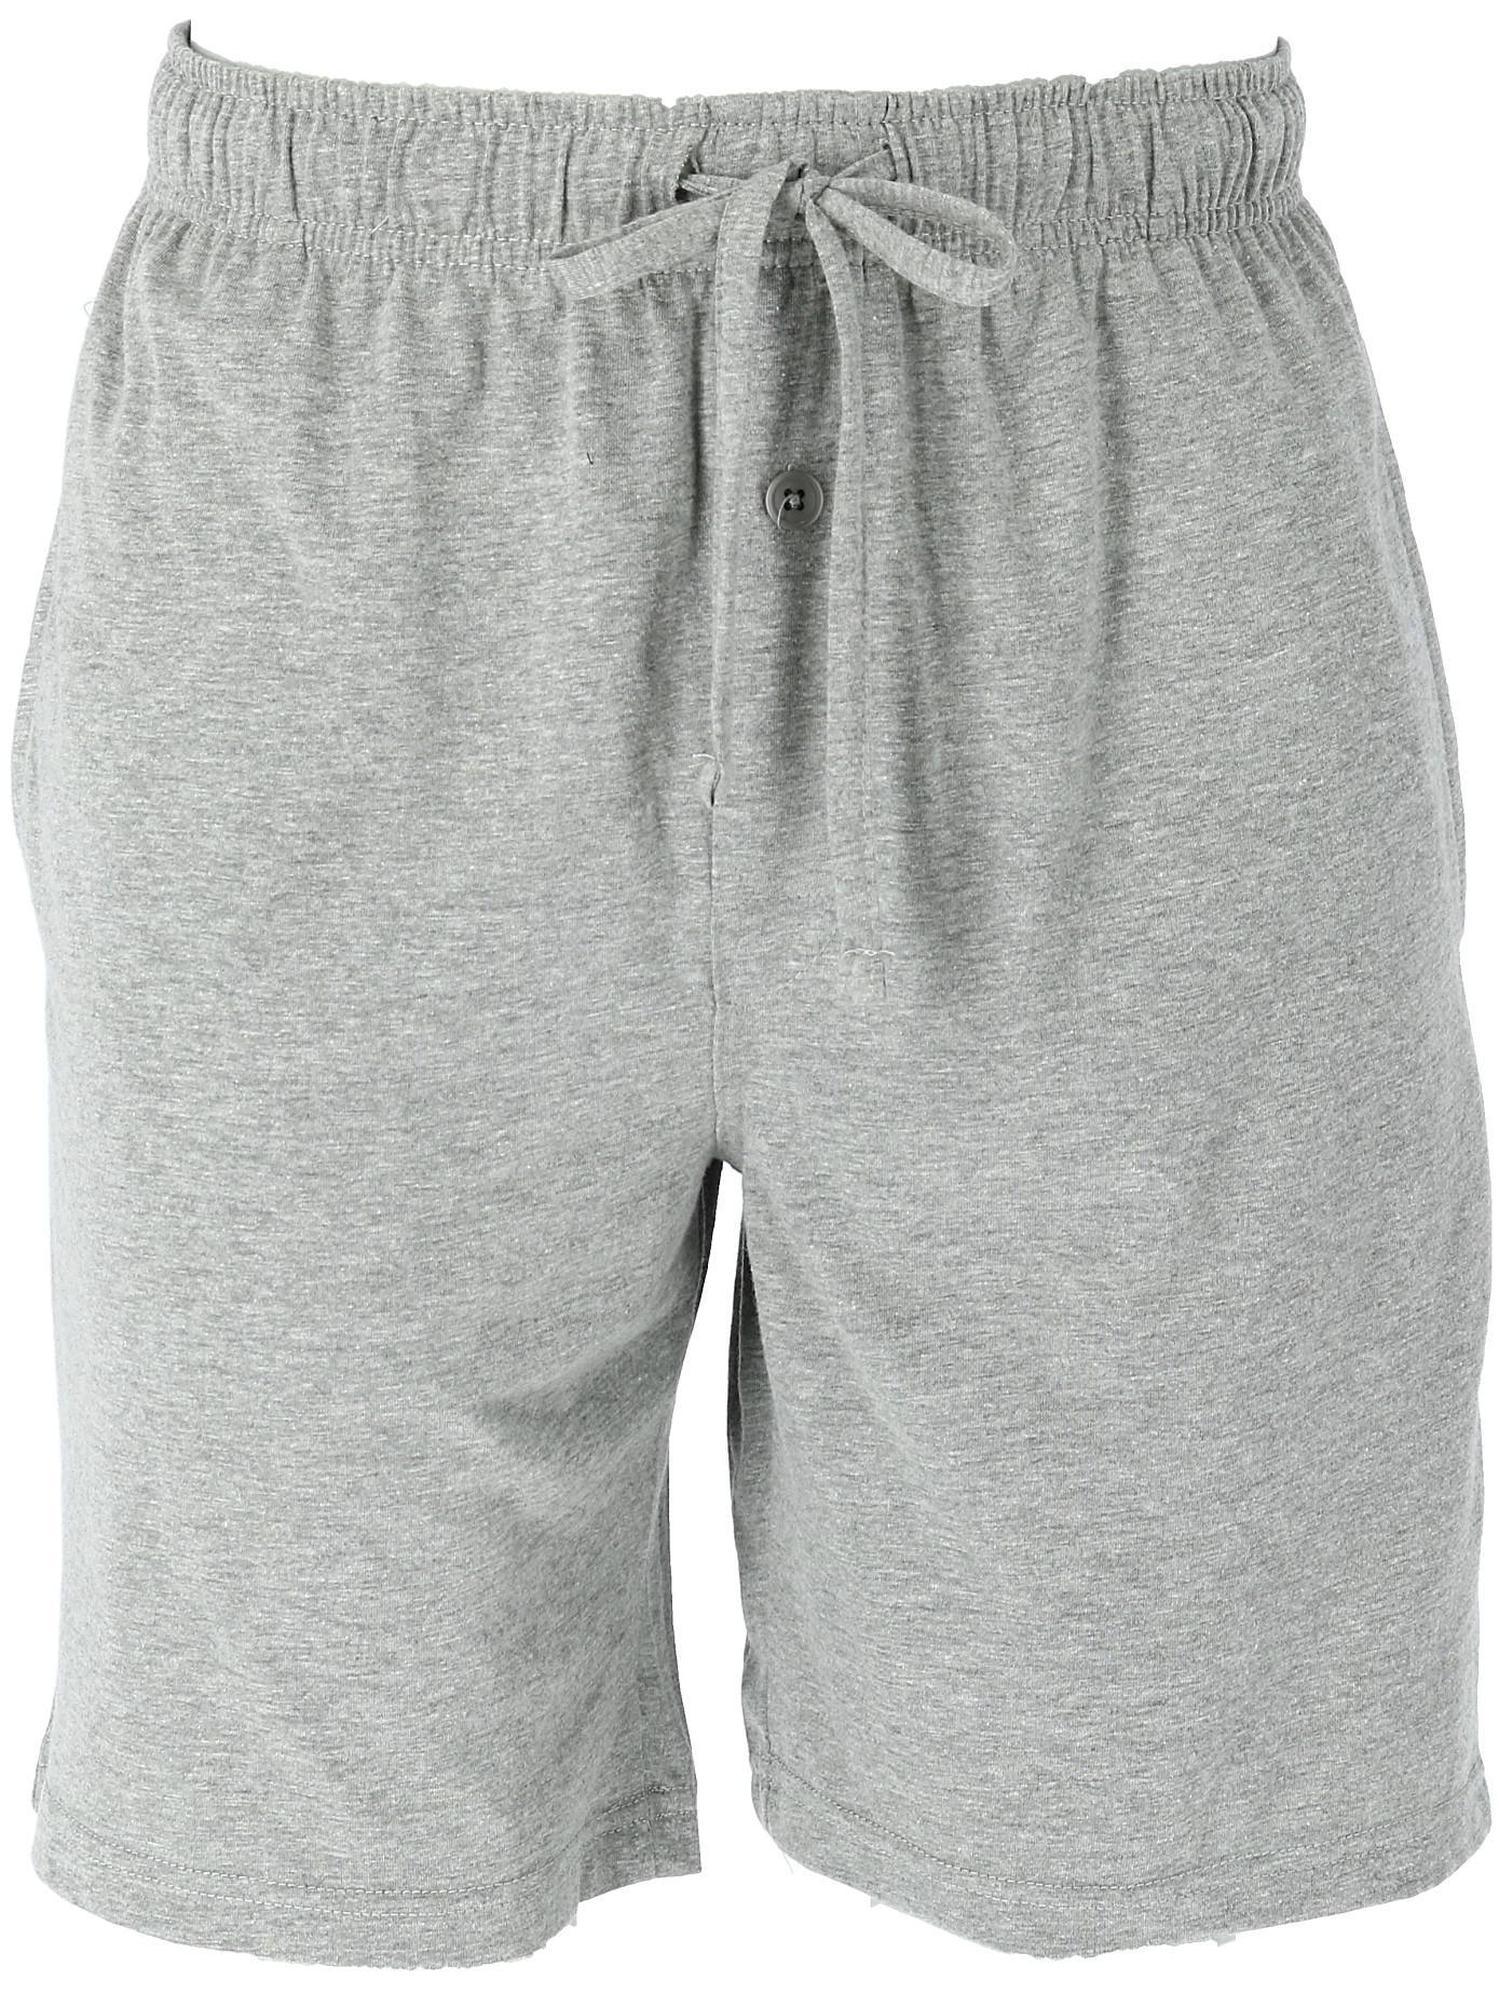 Men's Big and Tall Solid Knit Sleep Shorts